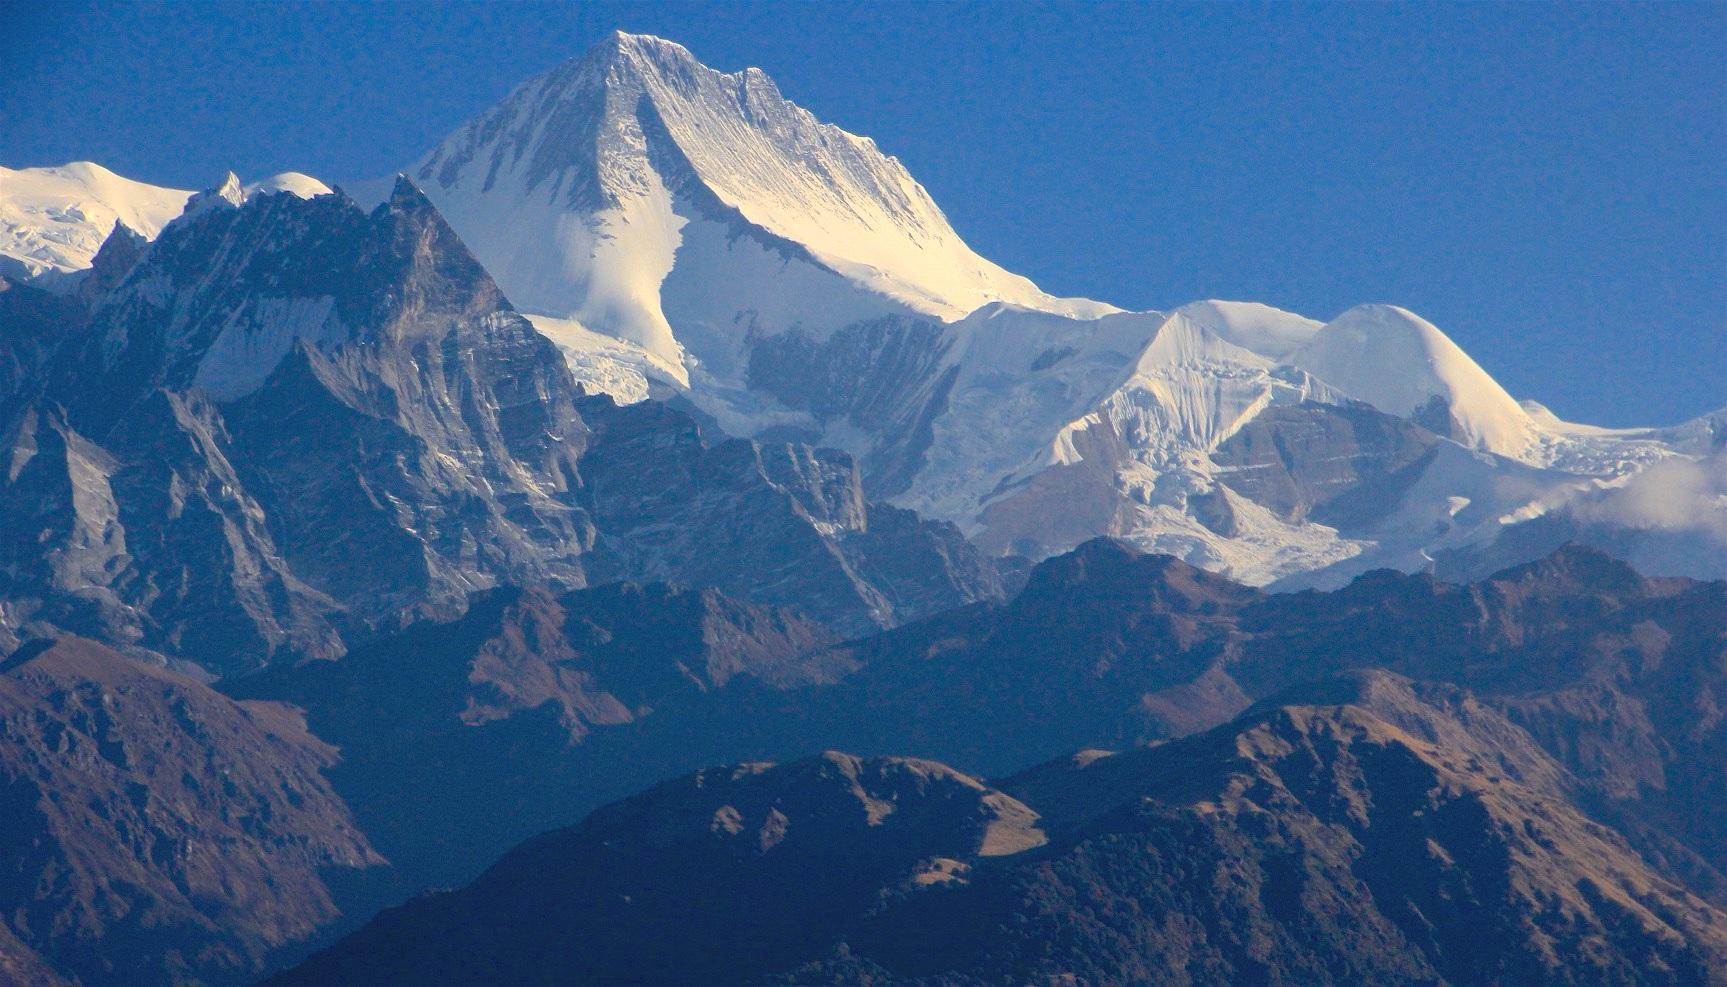 Annapurna II - almost 8,000m high